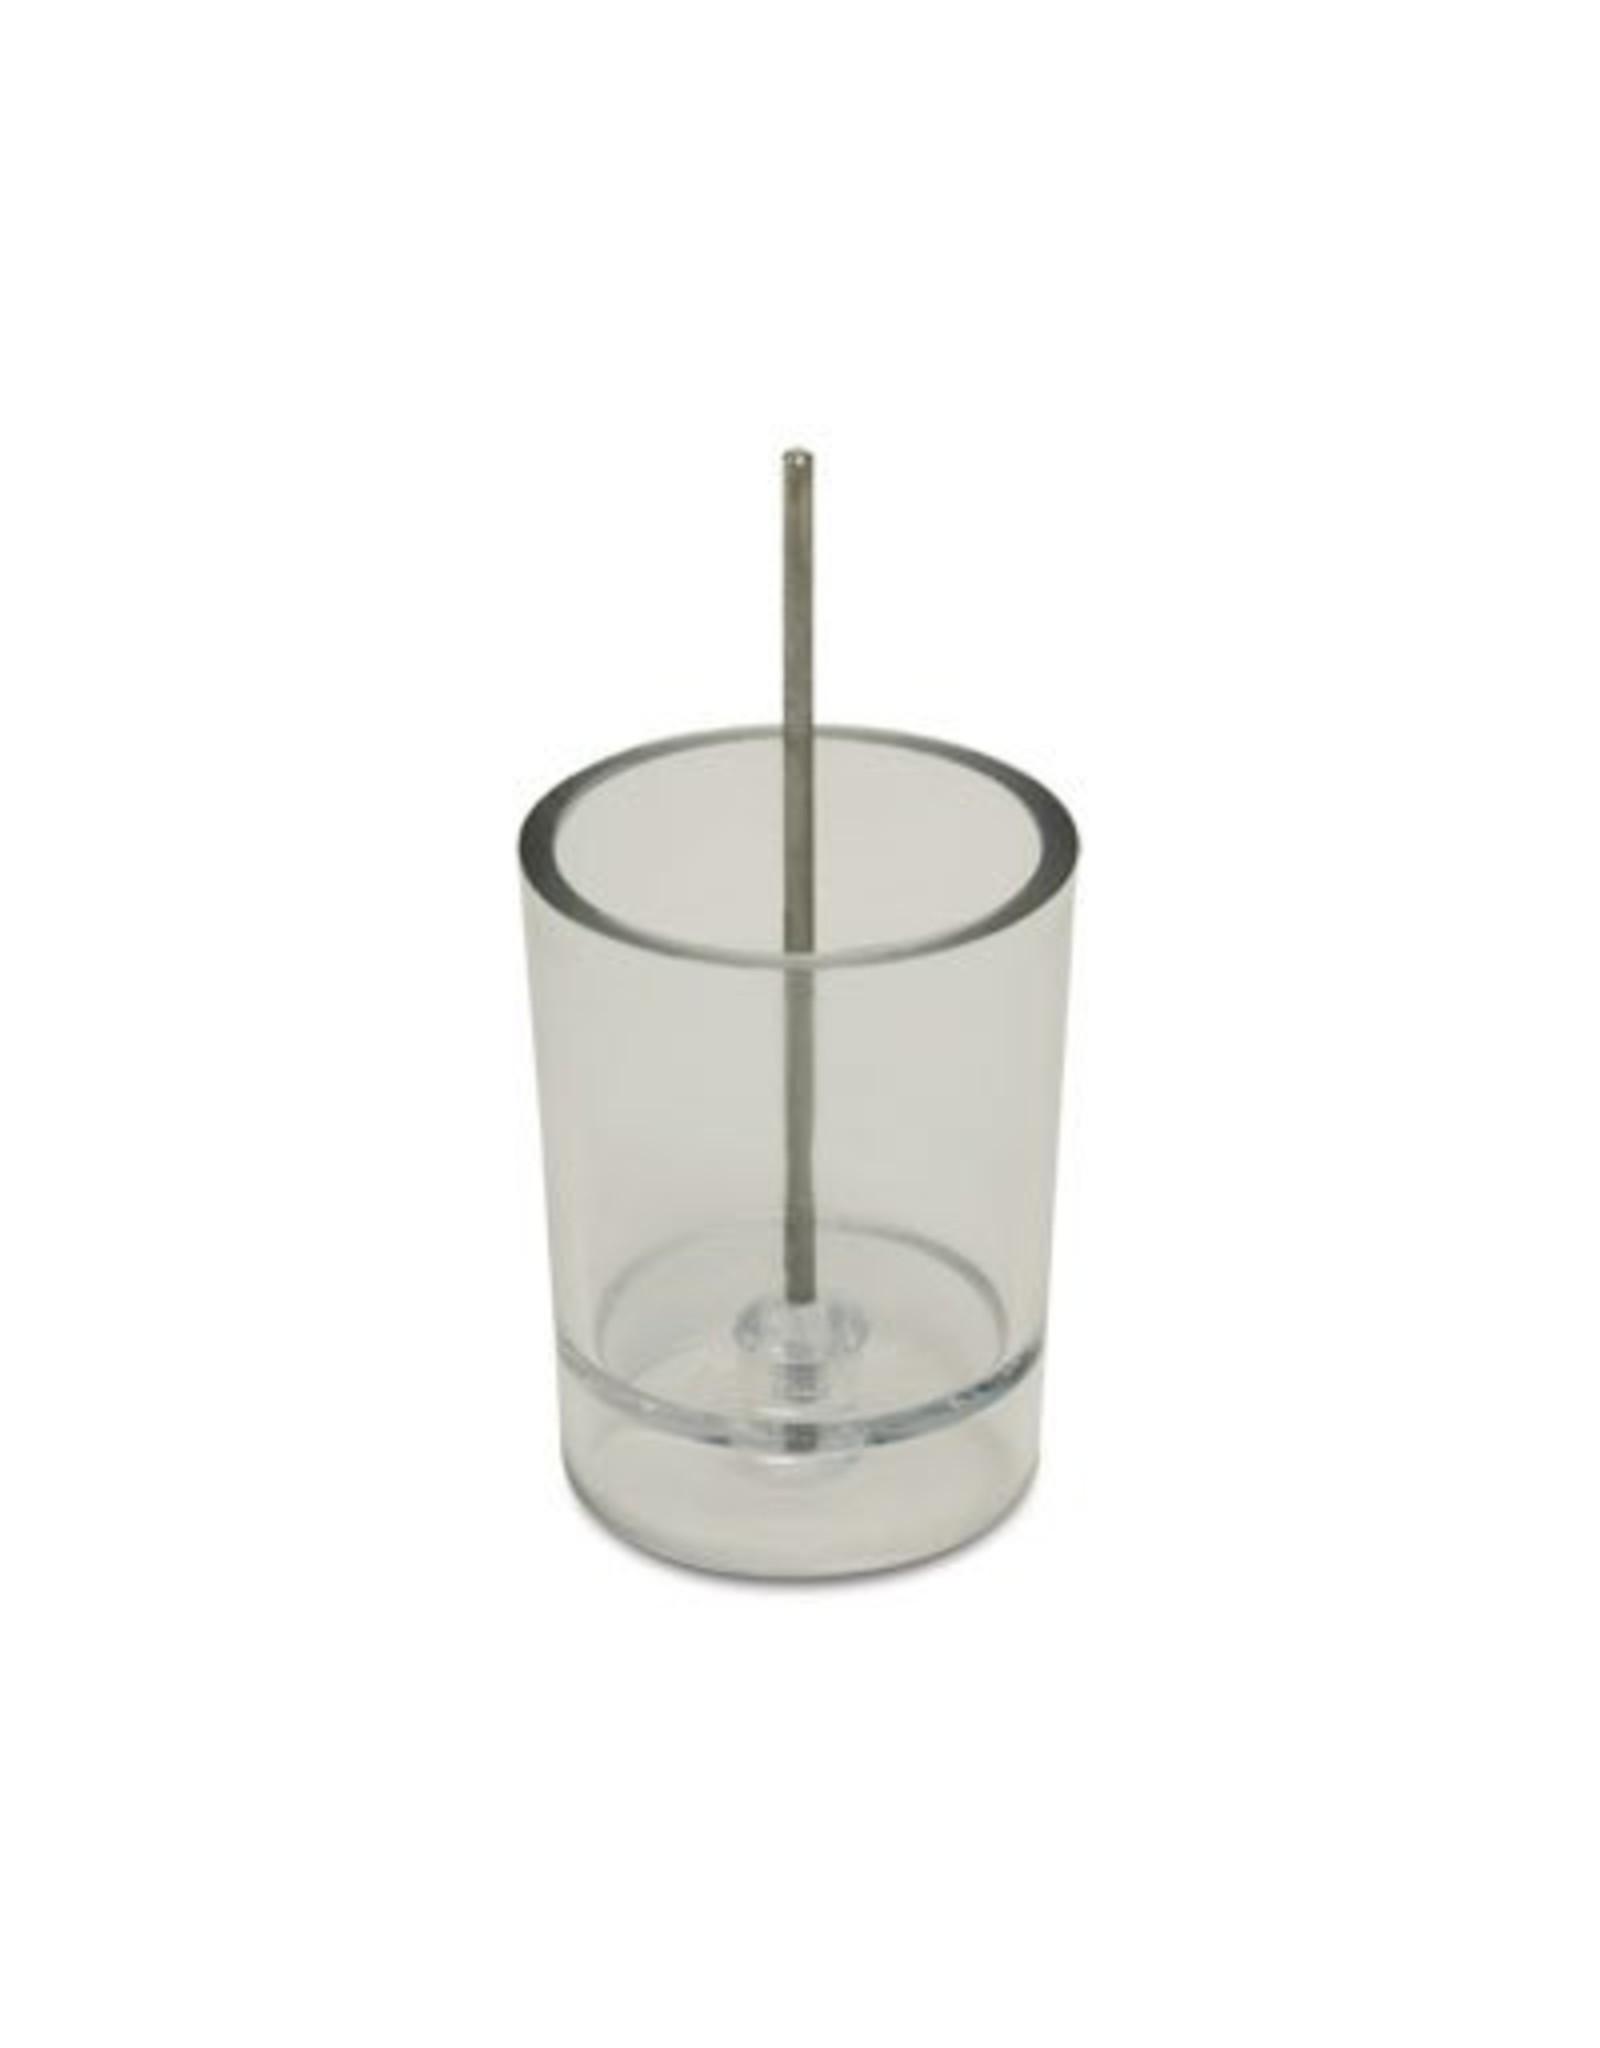 ASA ASA Fuel Tester Cup